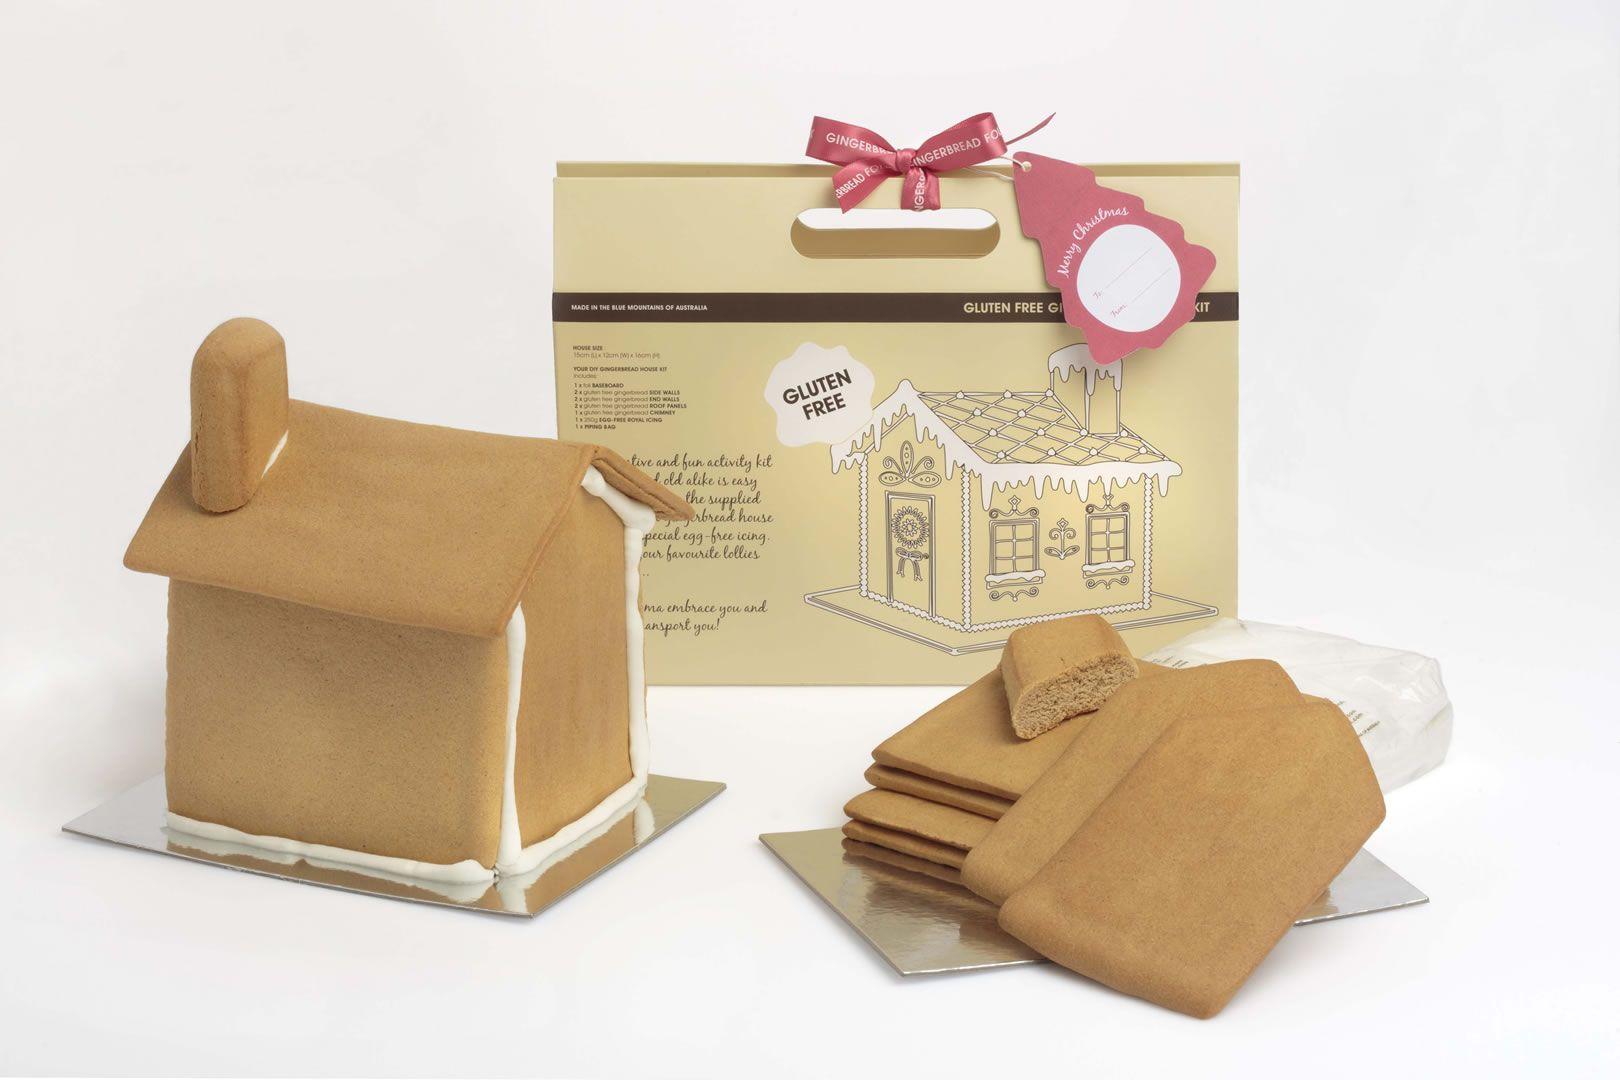 Gingerbread House Kit Gingerbread house kits, Gluten